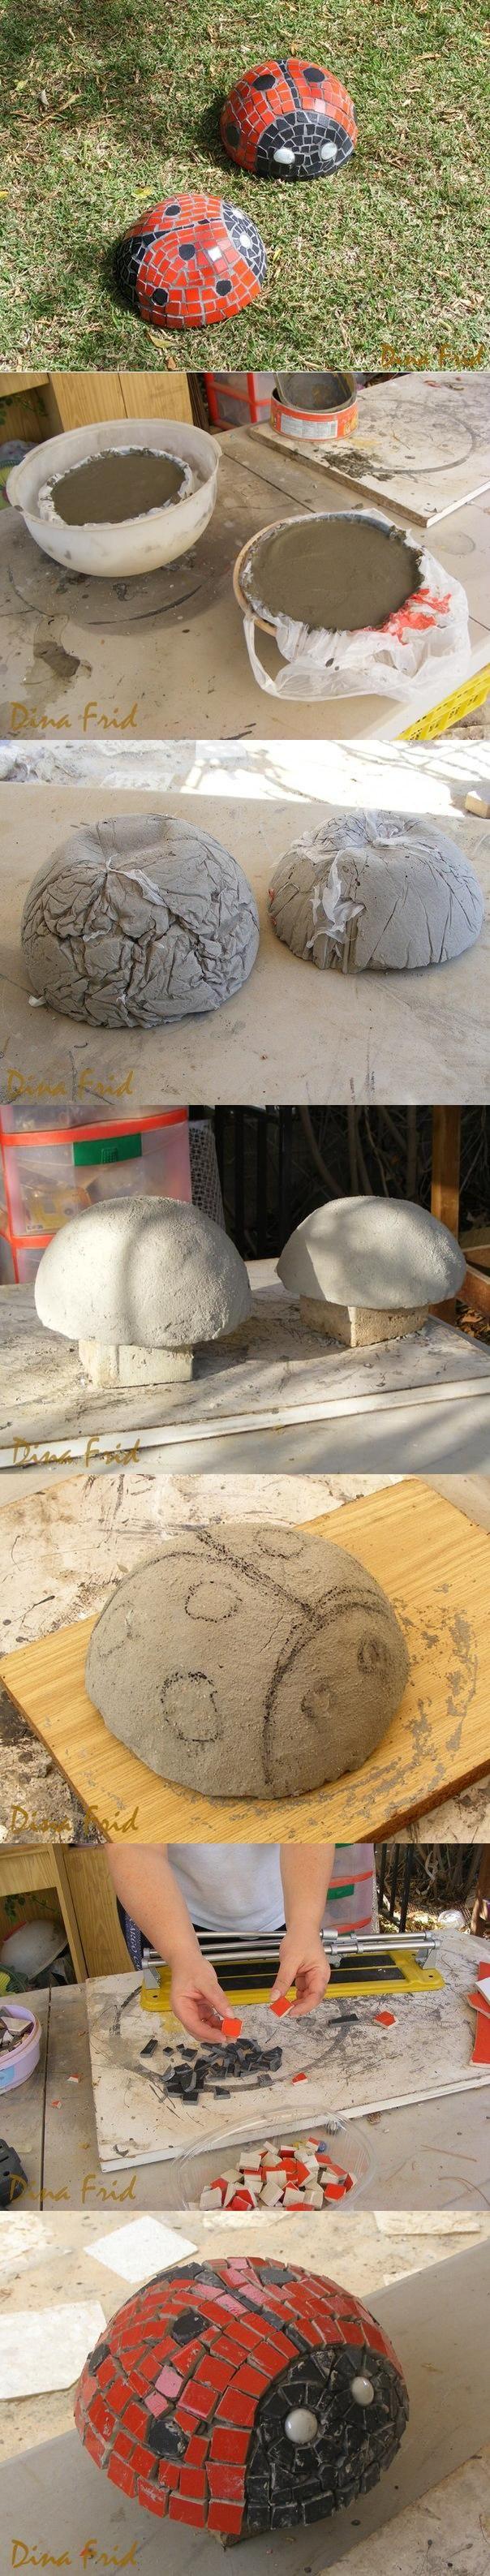 DIY Concrete Ladybug | FabDIY